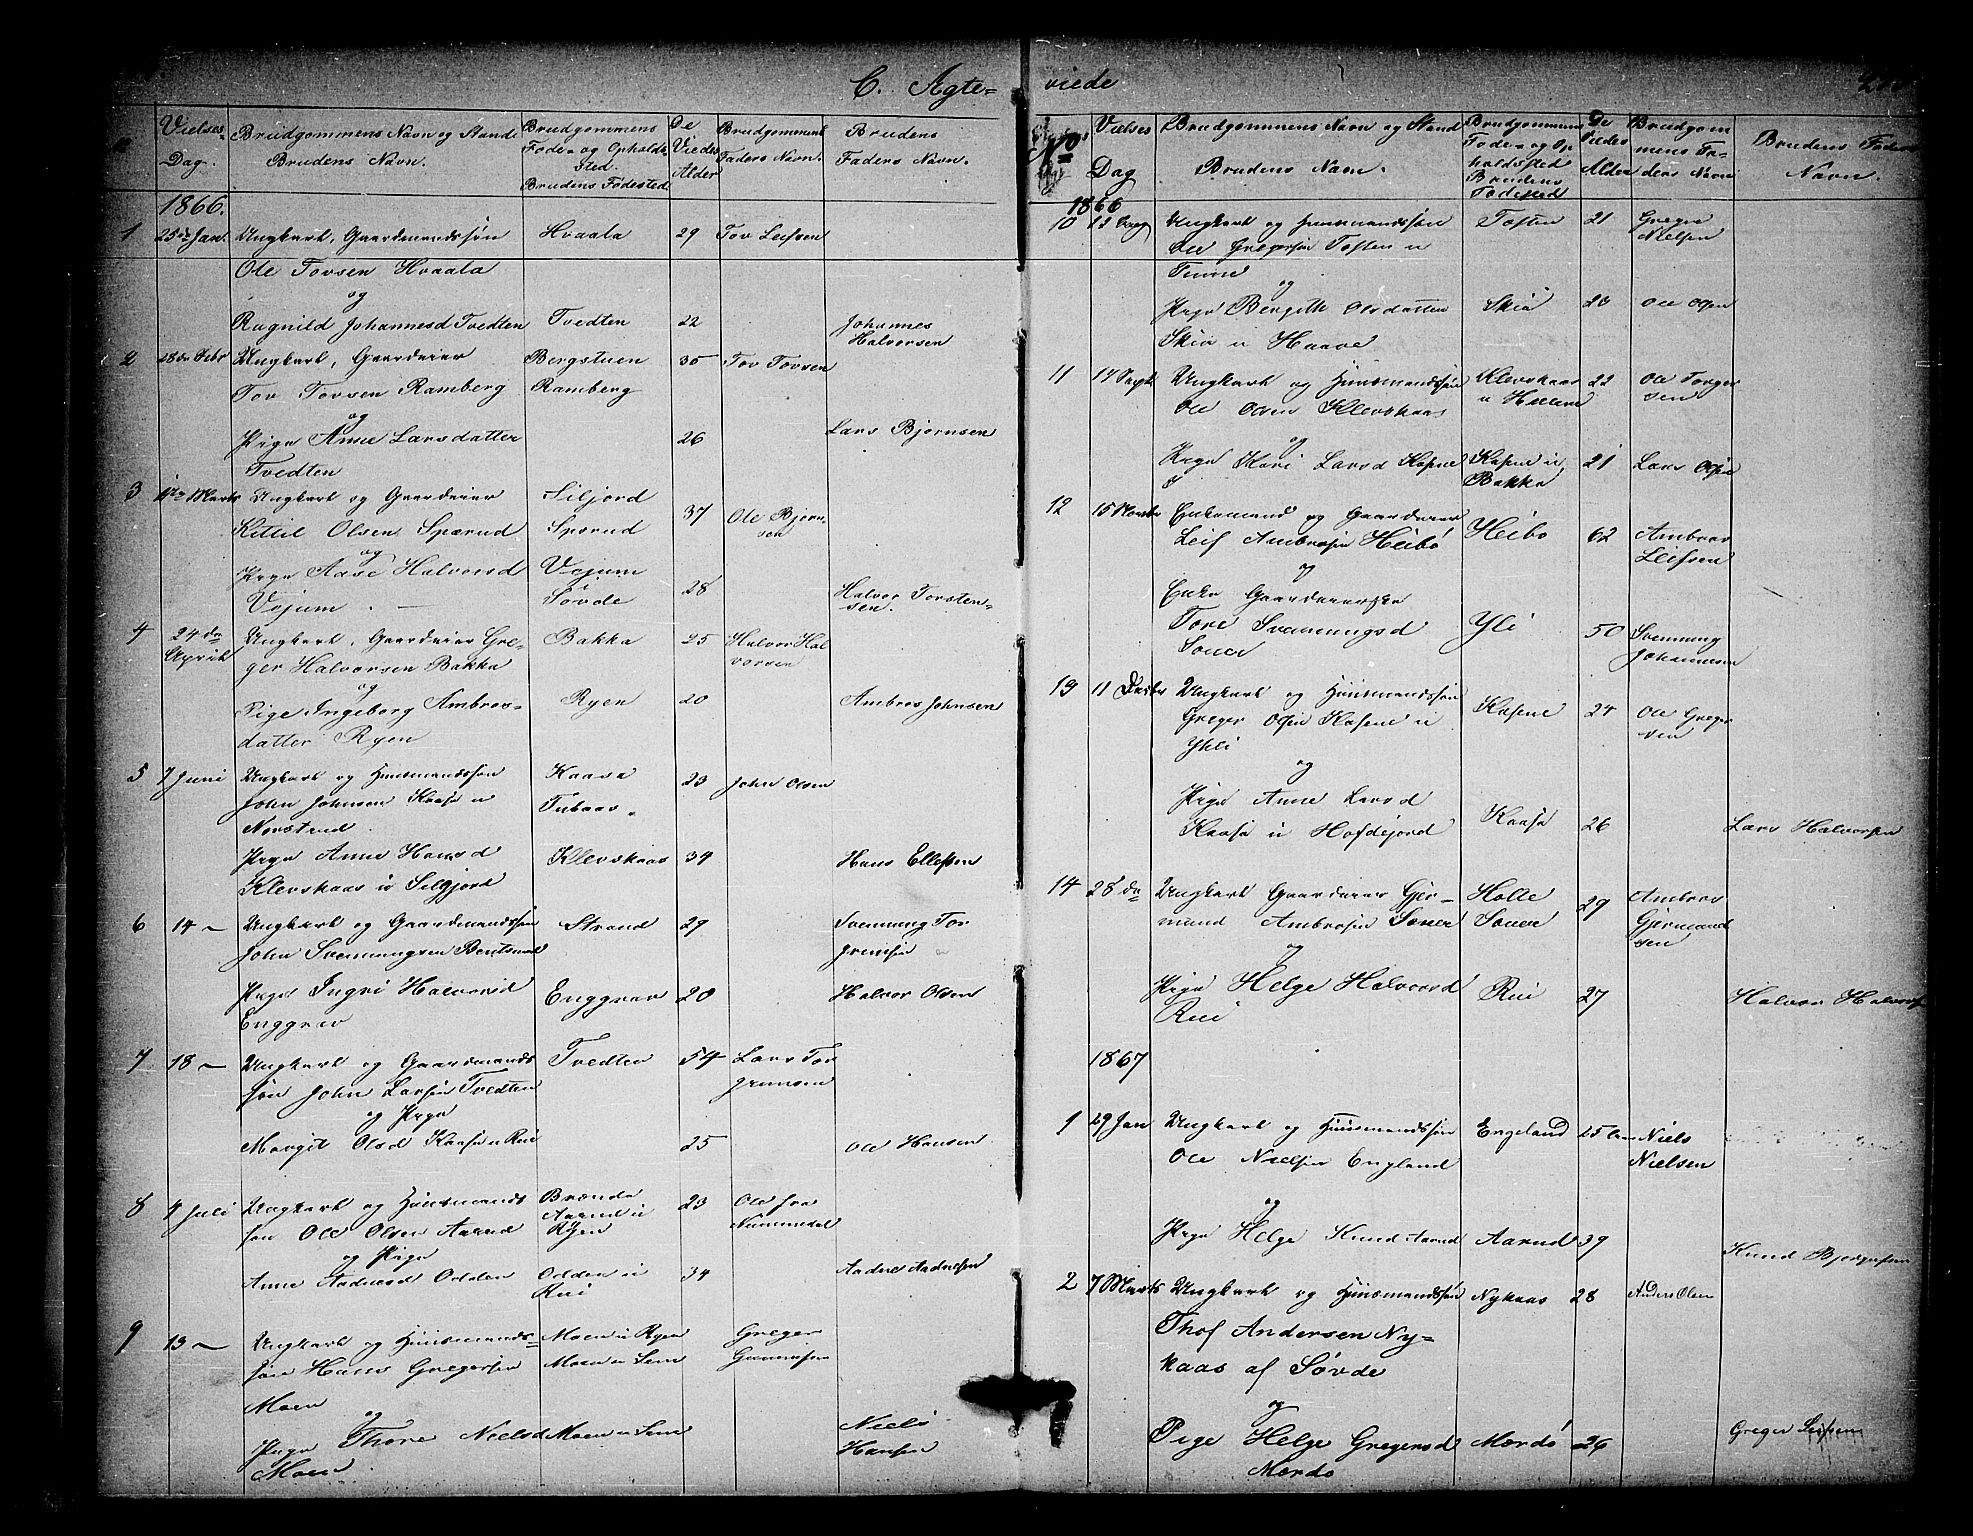 SAKO, Heddal kirkebøker, G/Ga/L0001: Klokkerbok nr. I 1, 1866-1878, s. 294-295